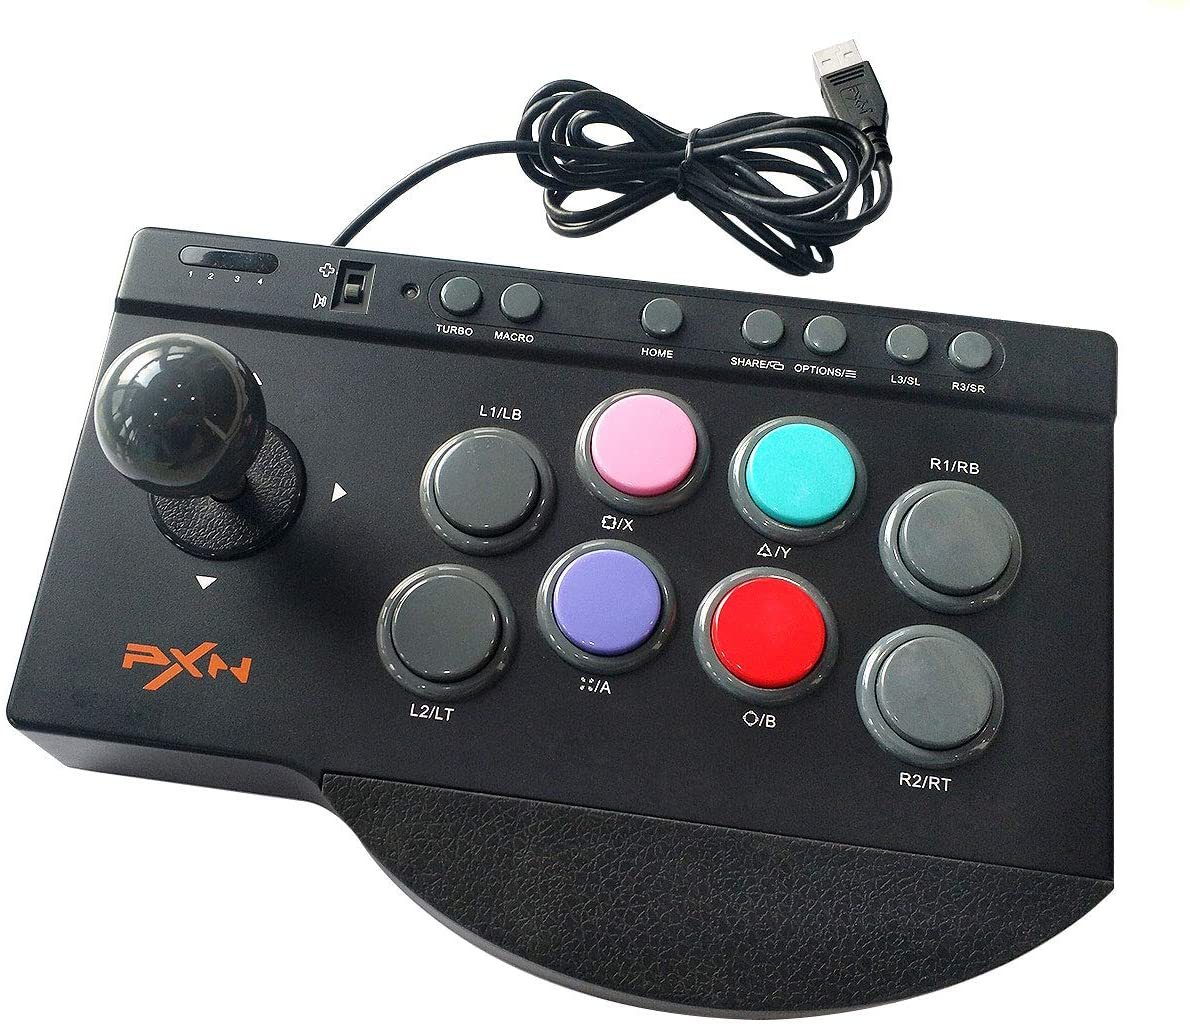 Joystick pc ps4 controlador para ps3/xbox um/nintendo interruptor jogo de luta arcade luta vara pxn 0082 usb street fighter